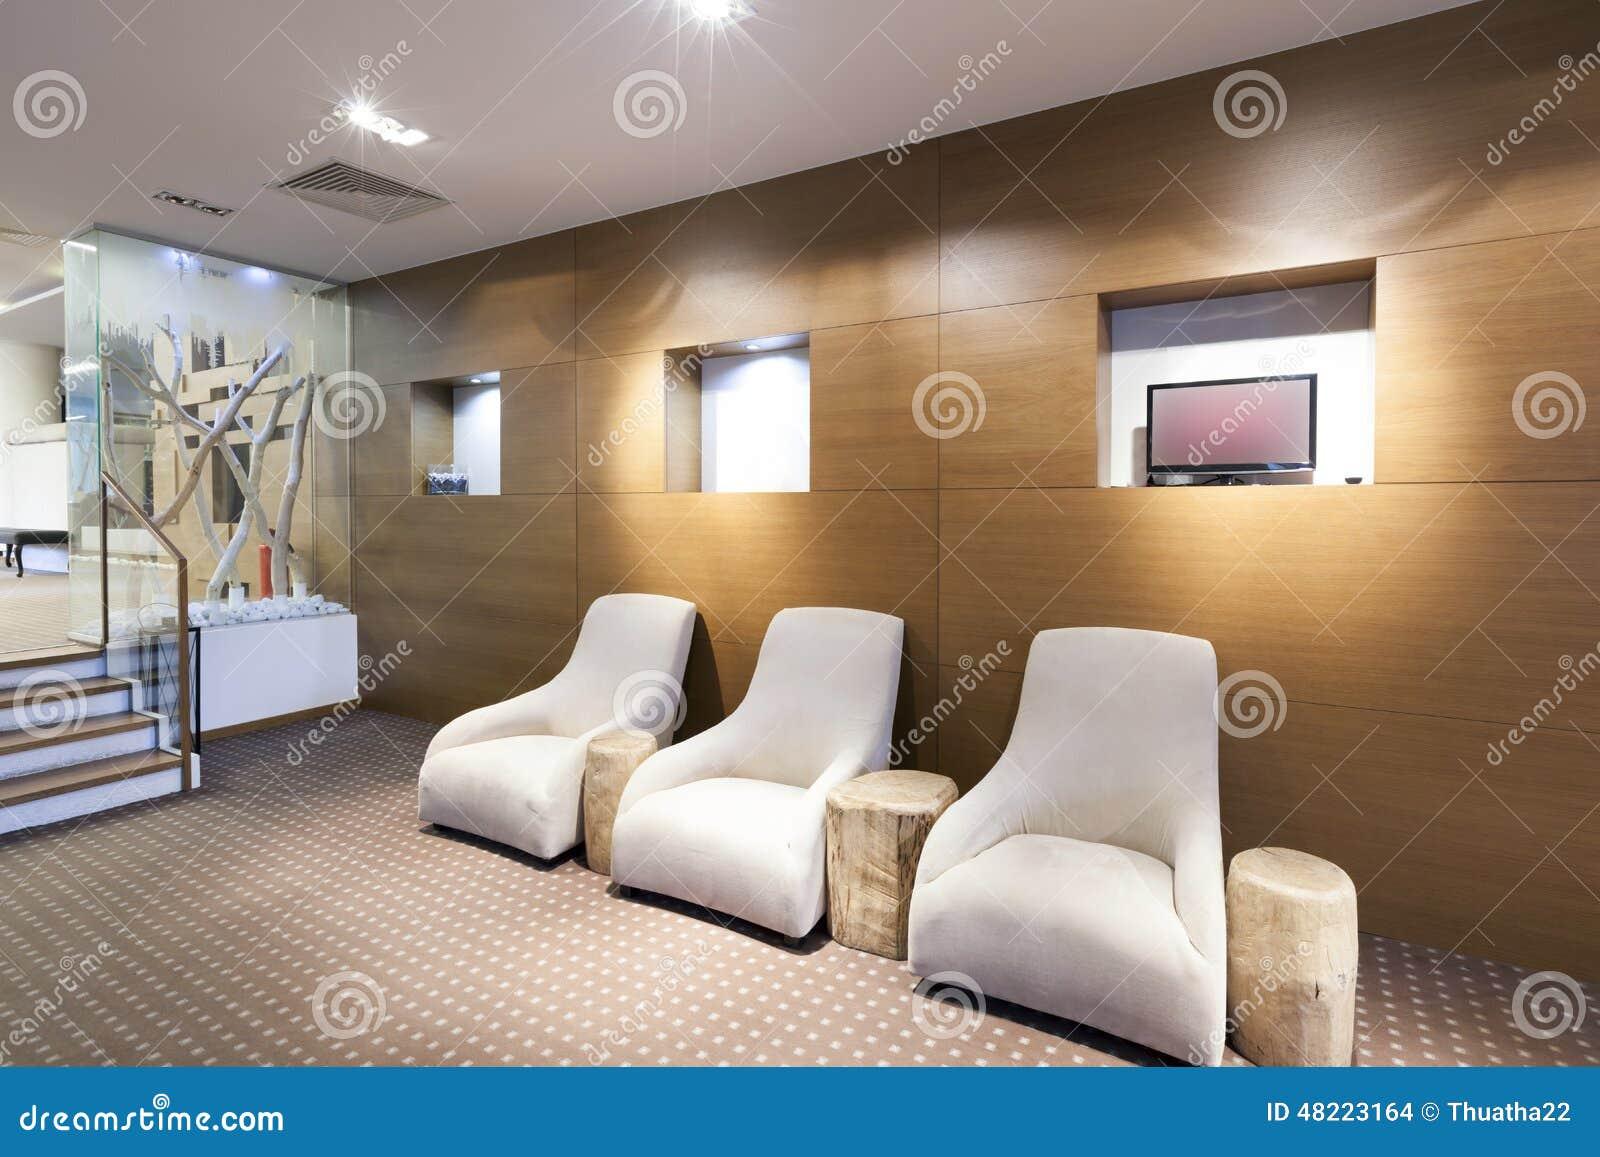 Interior Of A Modern Hotel Lobby Stock Photo - Image of decor, lobby: 48223164